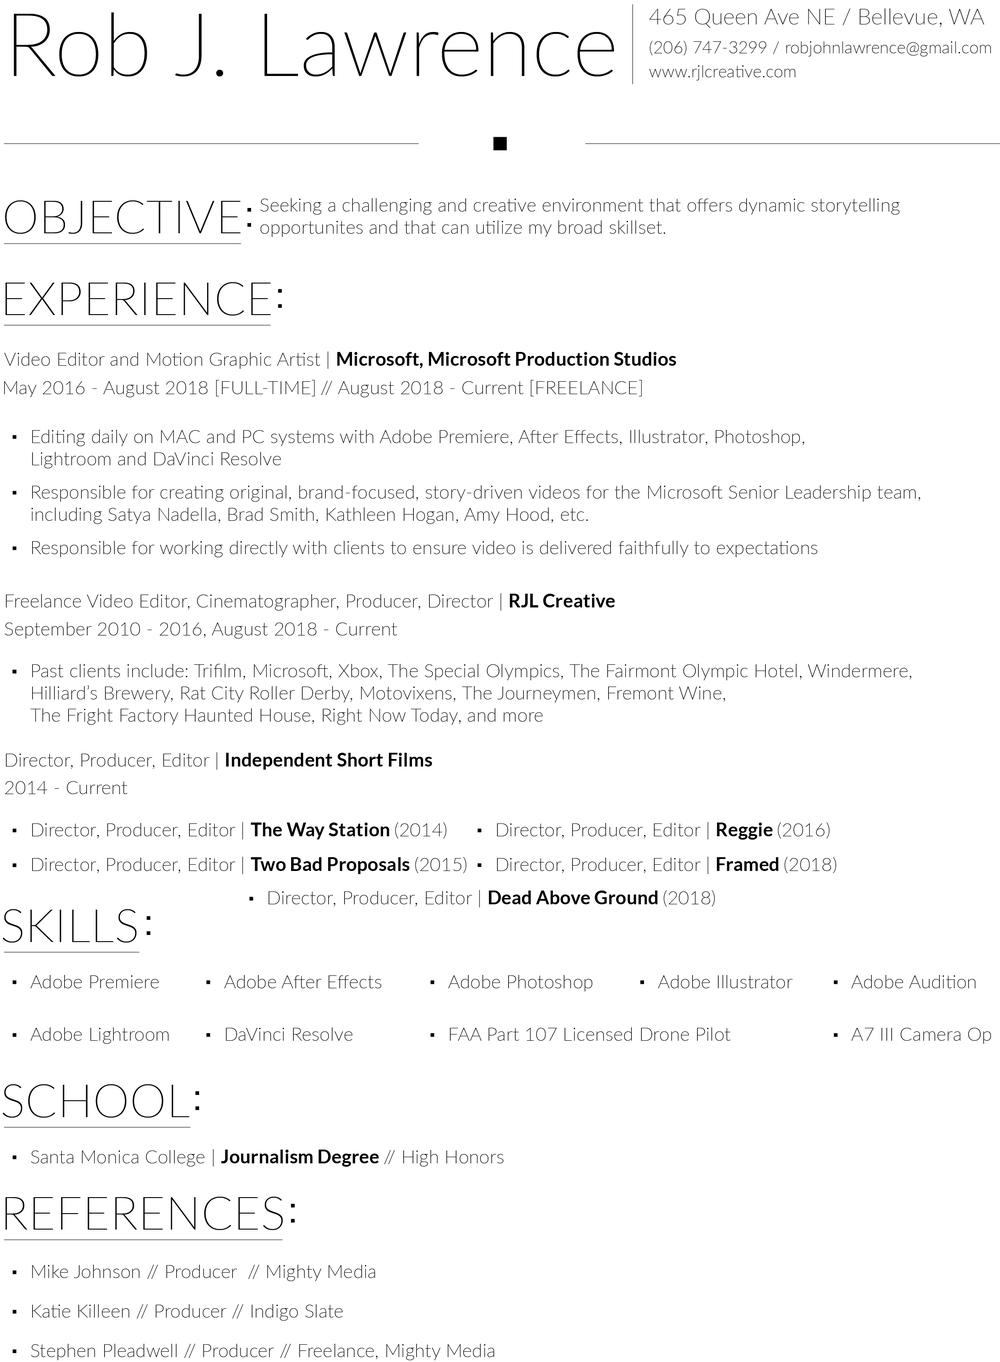 resume robjohnlawrence gmail com